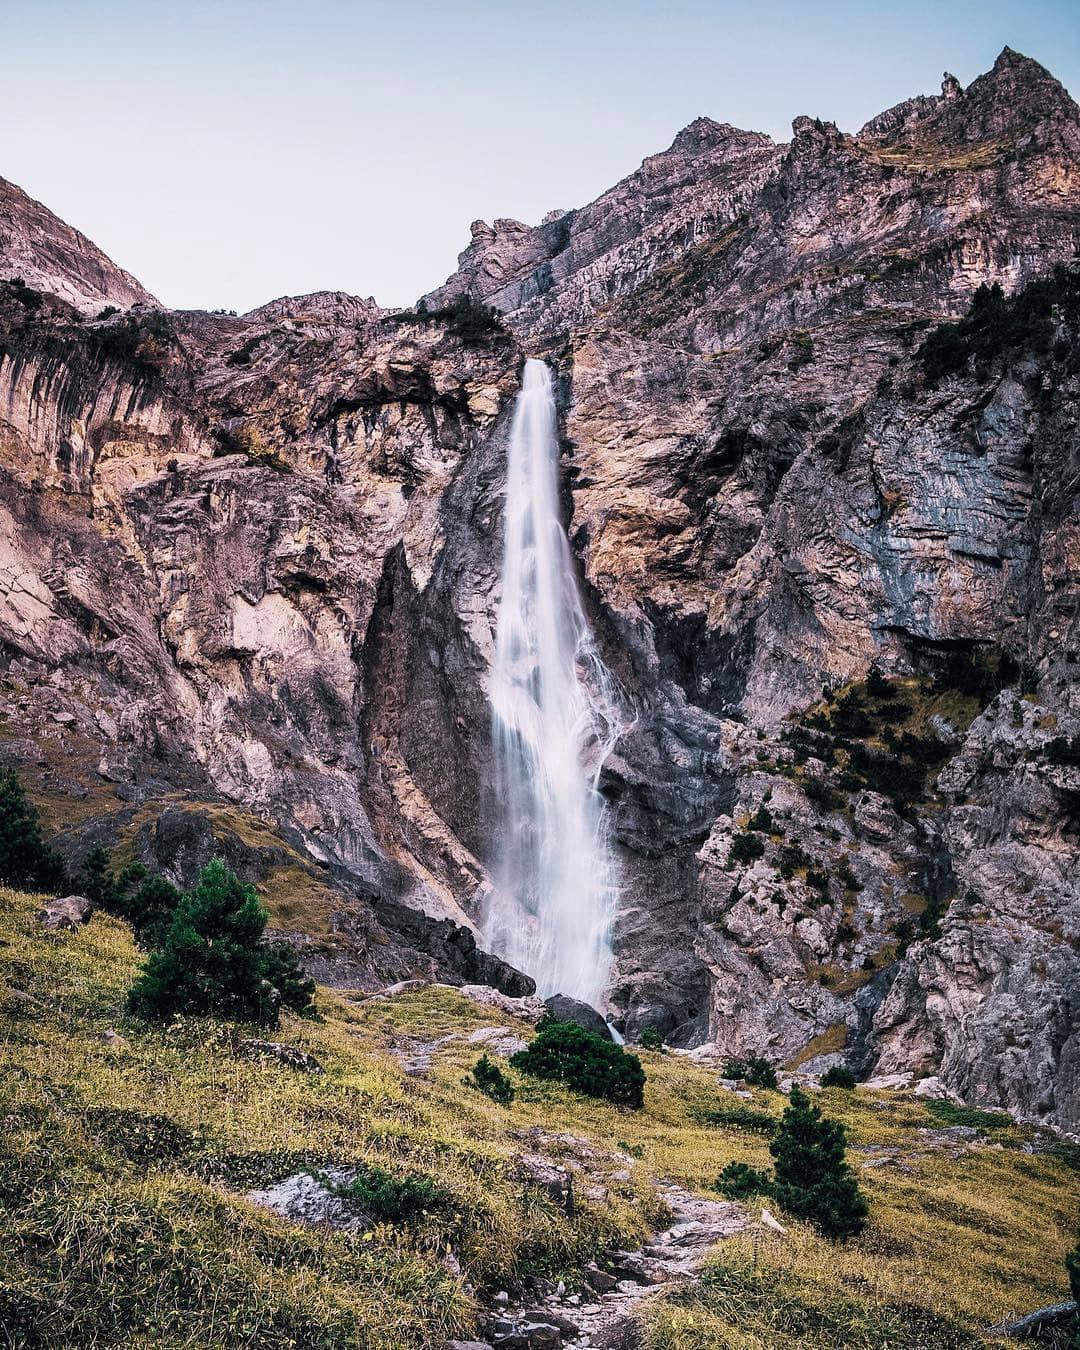 Fotografía montaña Pirineos by @alexvazquez001